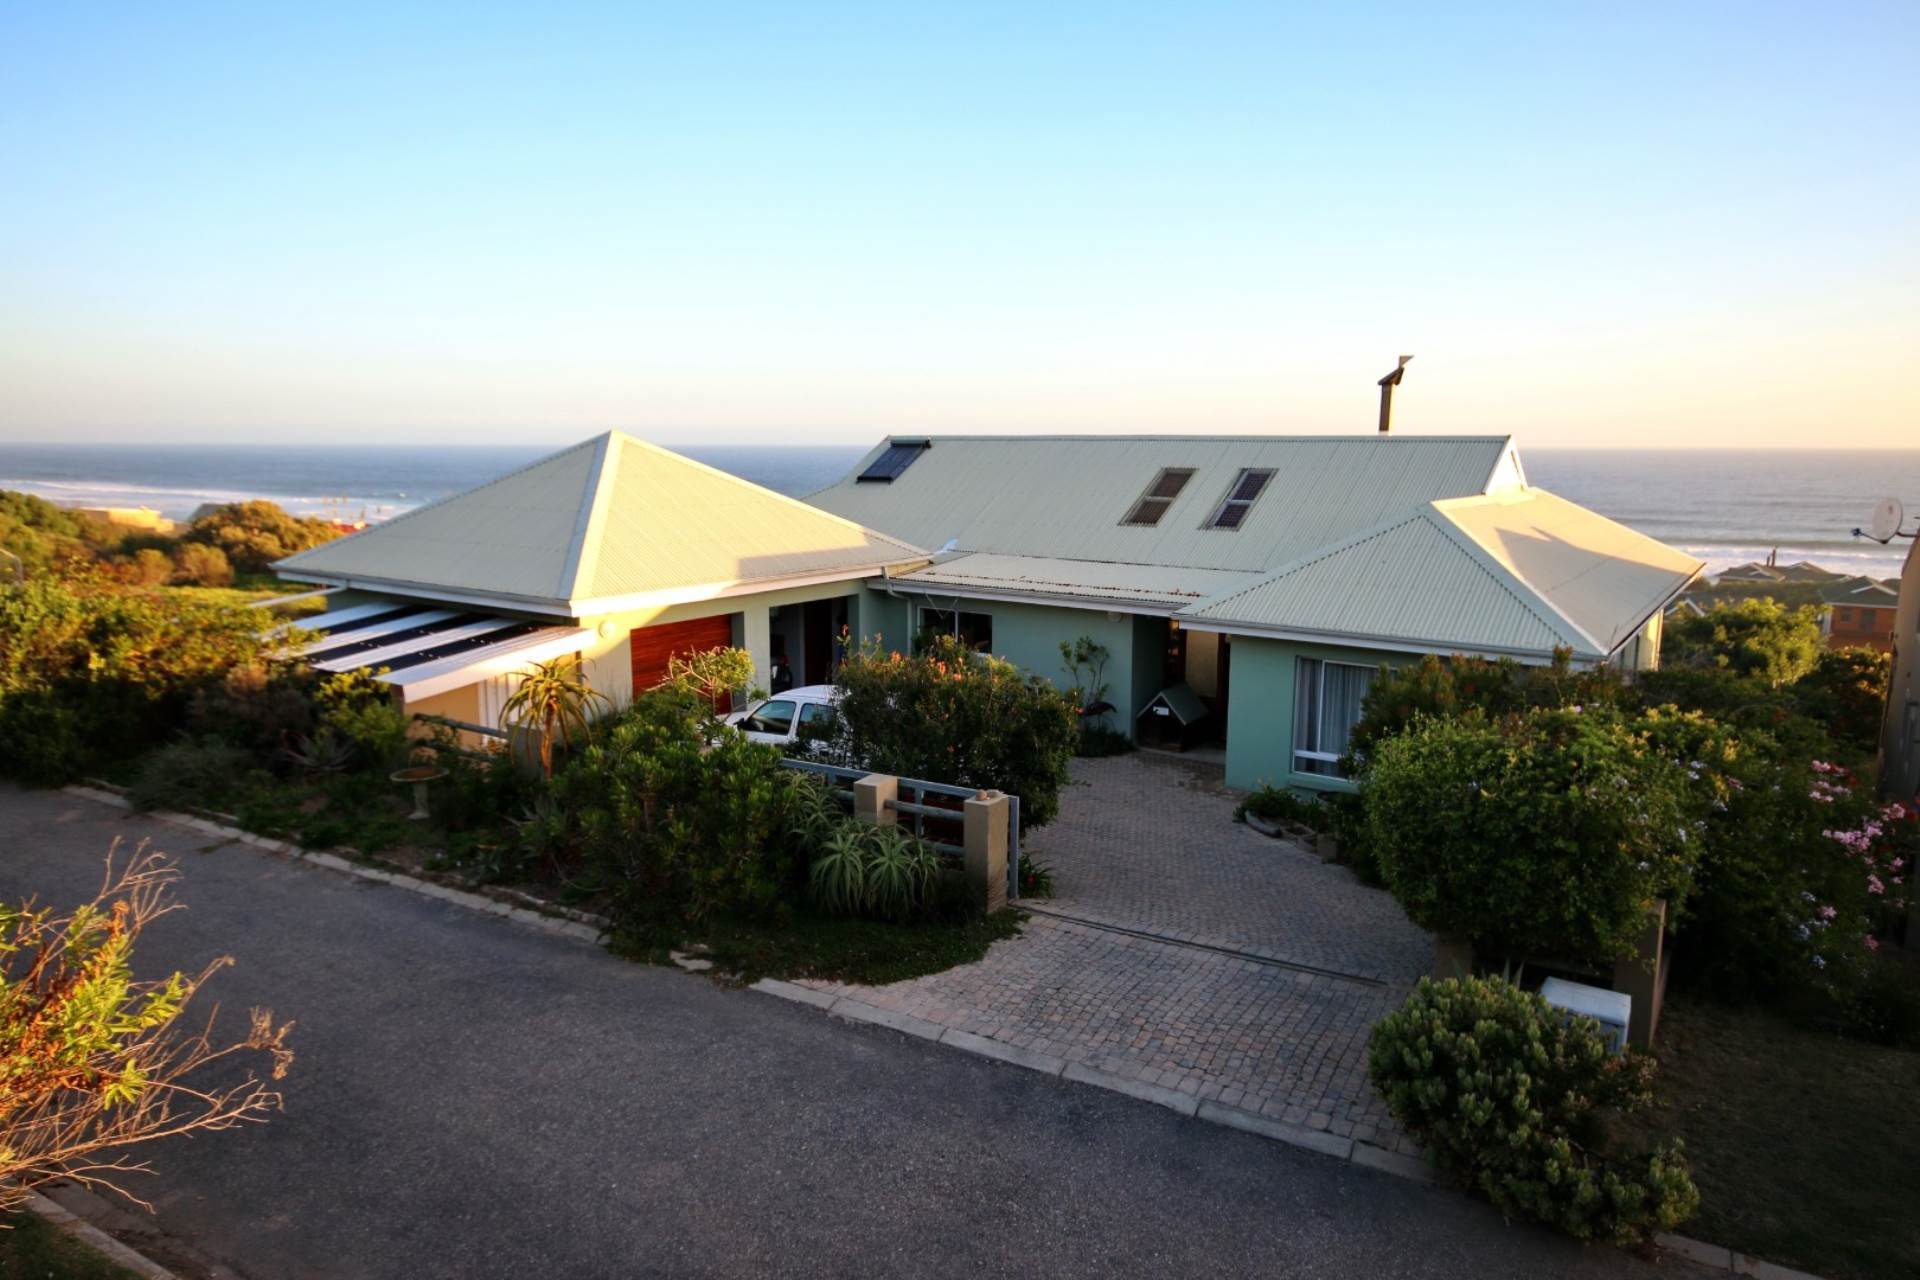 5 BedroomHouse For Sale In Dwarswegstrand